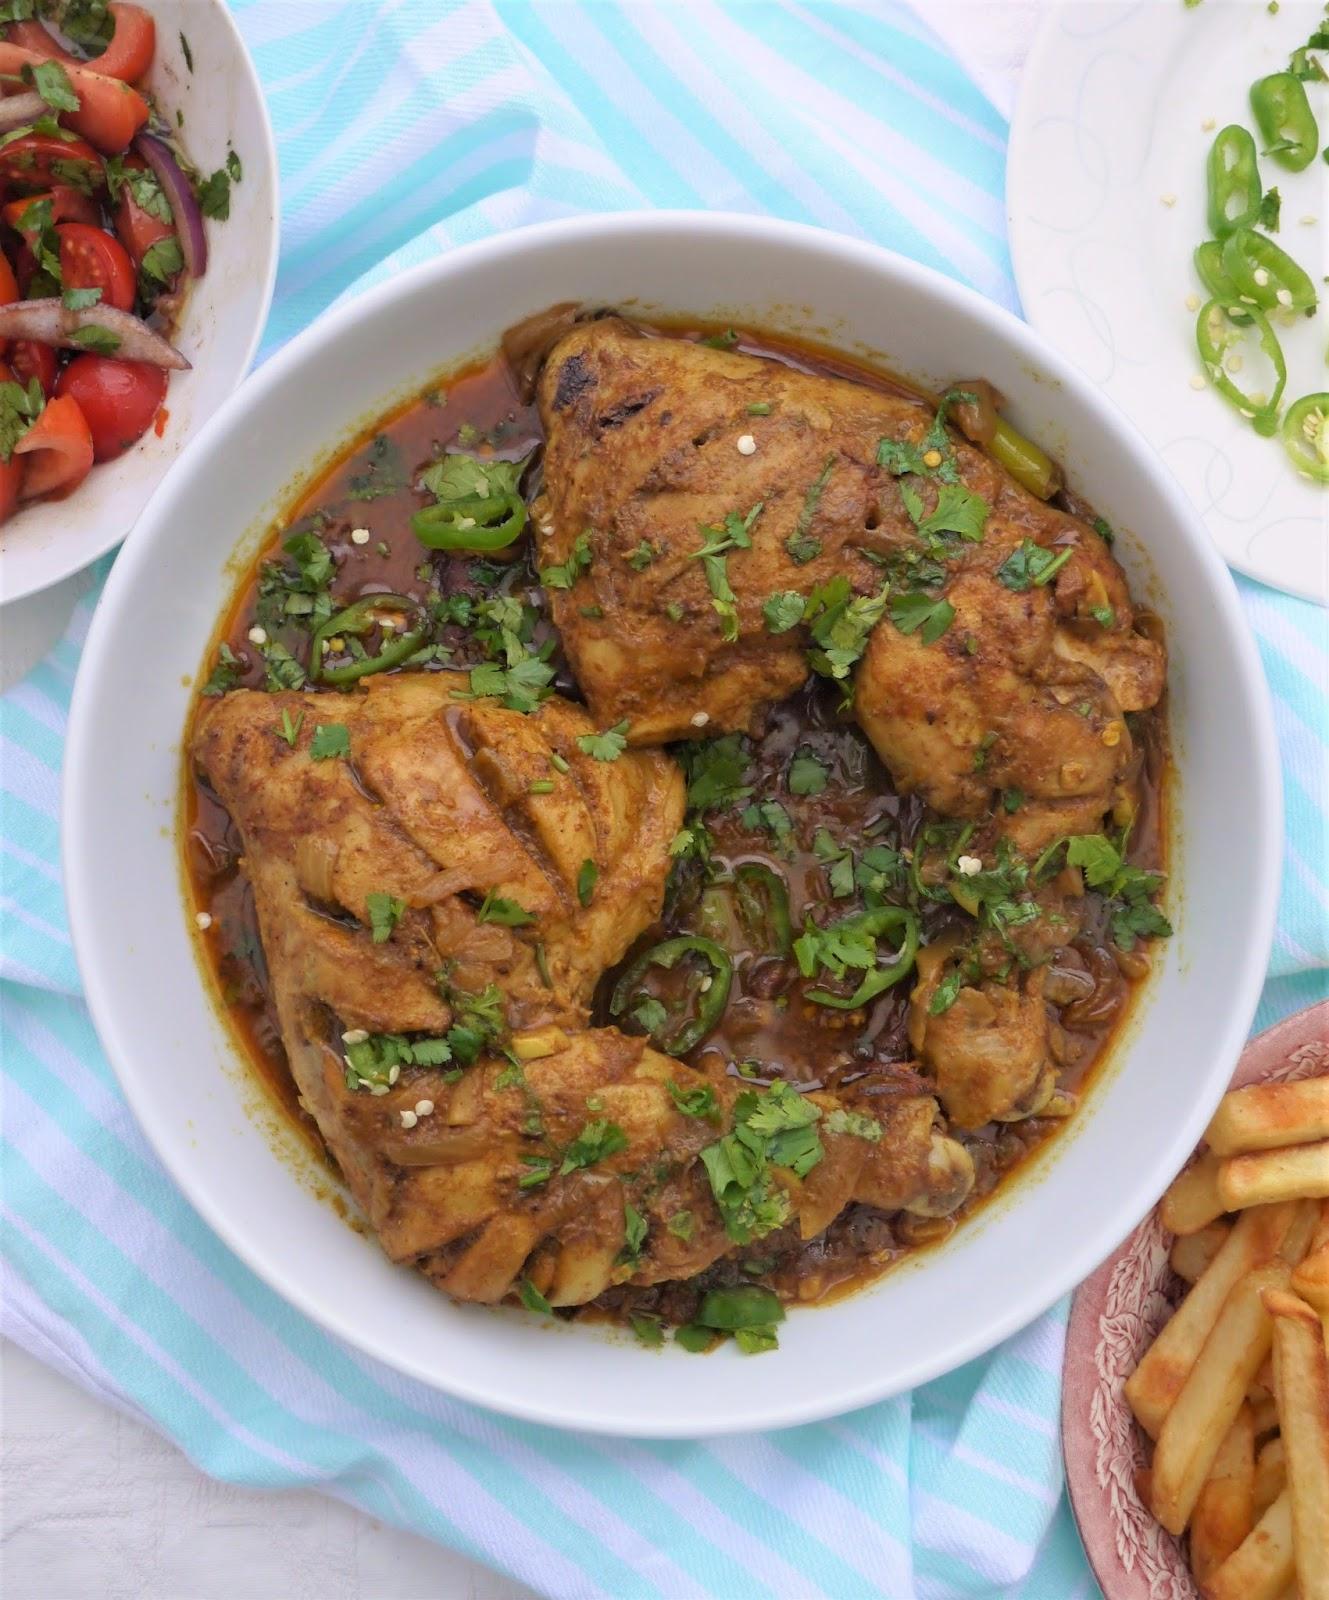 chicken muslim girl personals Muslim biryani / how to make muslim biryani / step by step the muslim chicken biryani tric but just and essence of smell for our special muslim biryani.